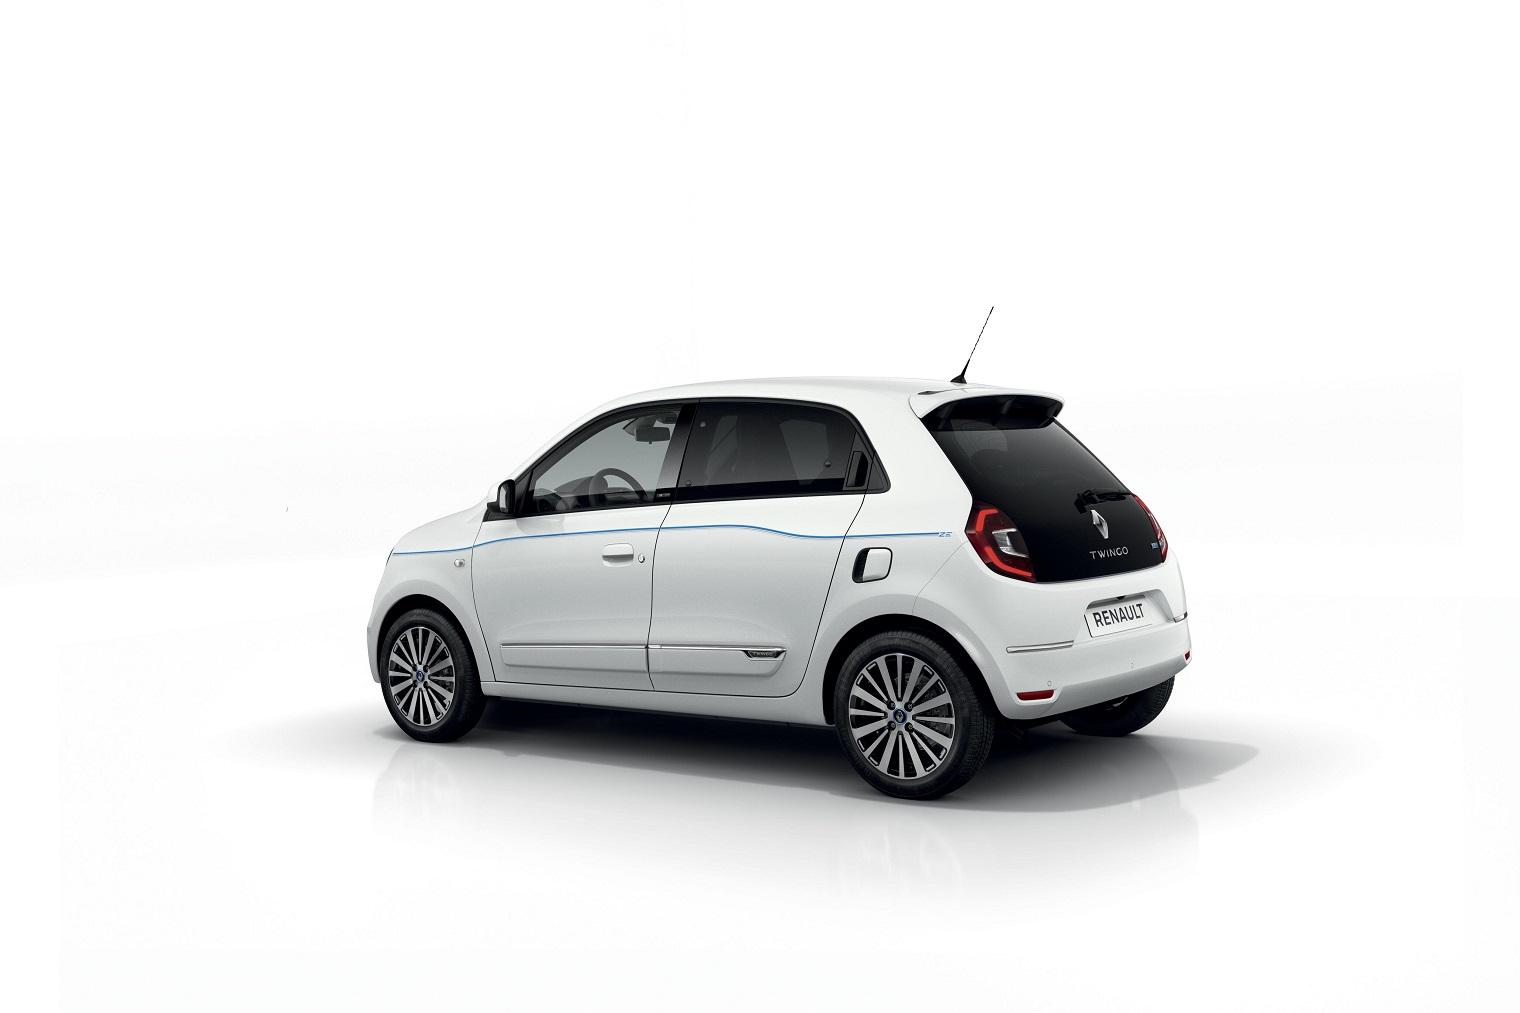 esterni nuova Renault Twingo elettrica